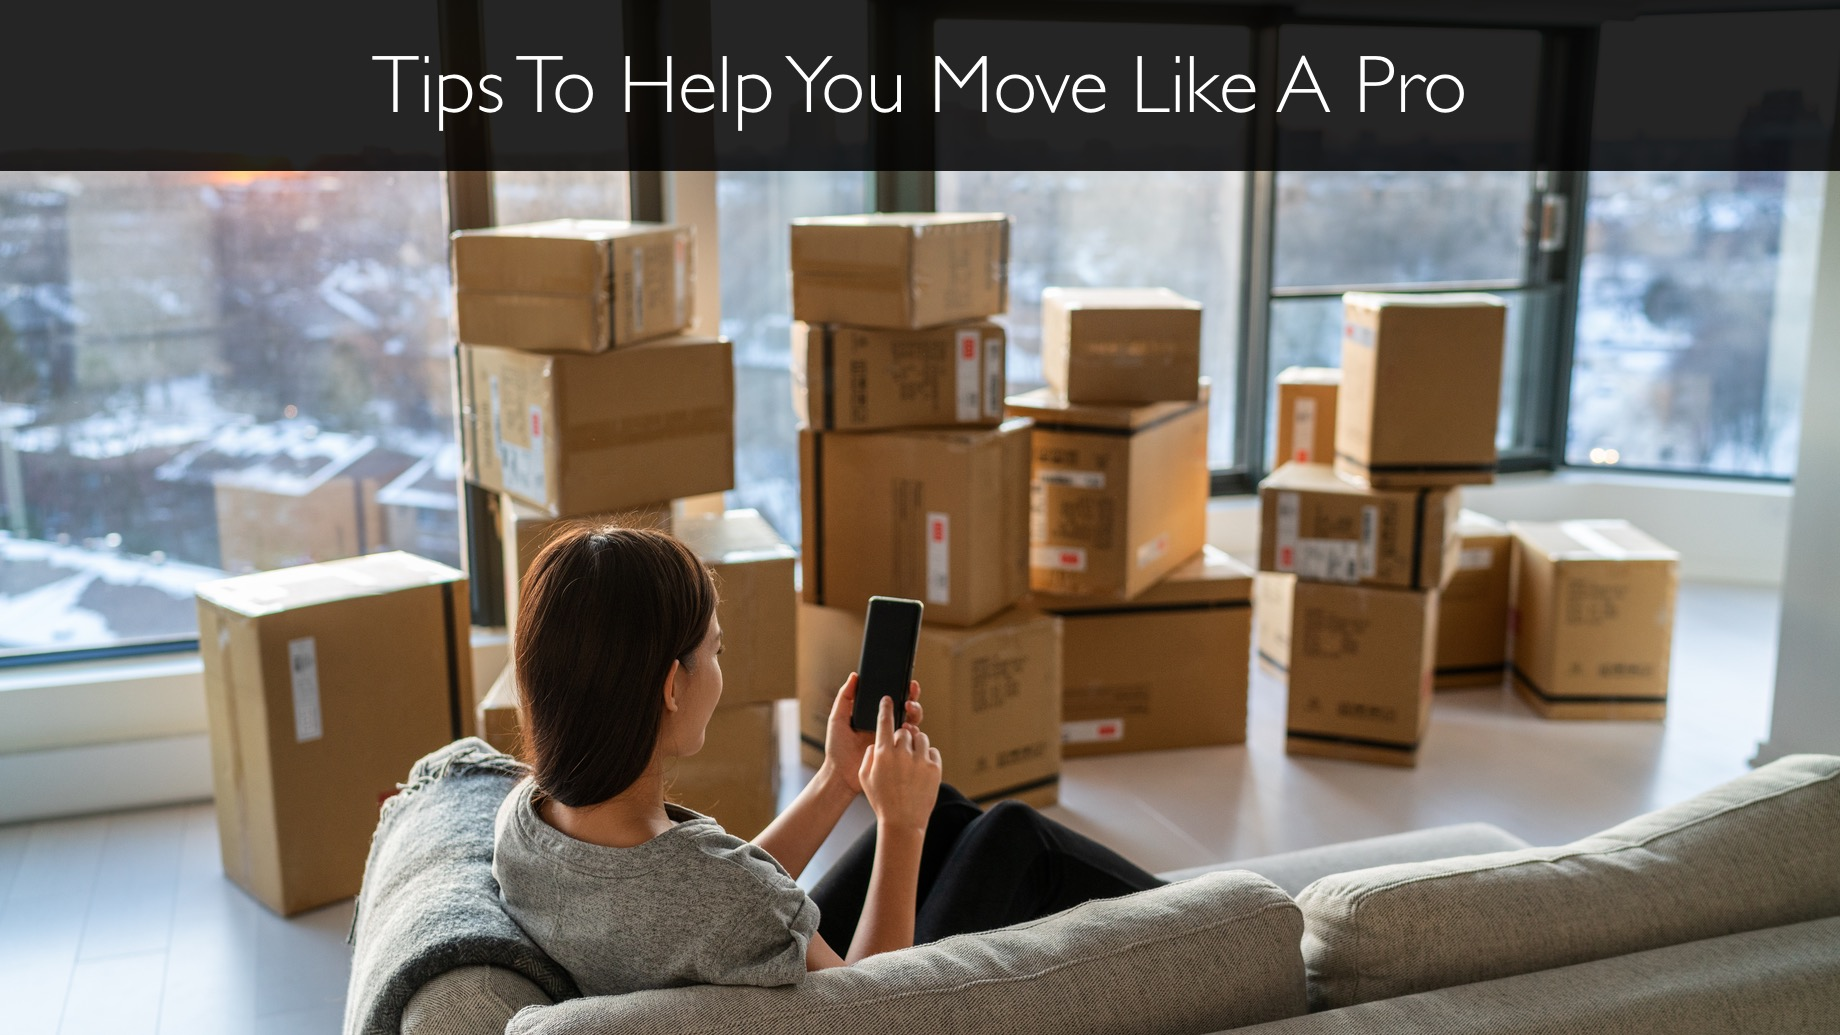 Tips To Help You Move Like A Pro